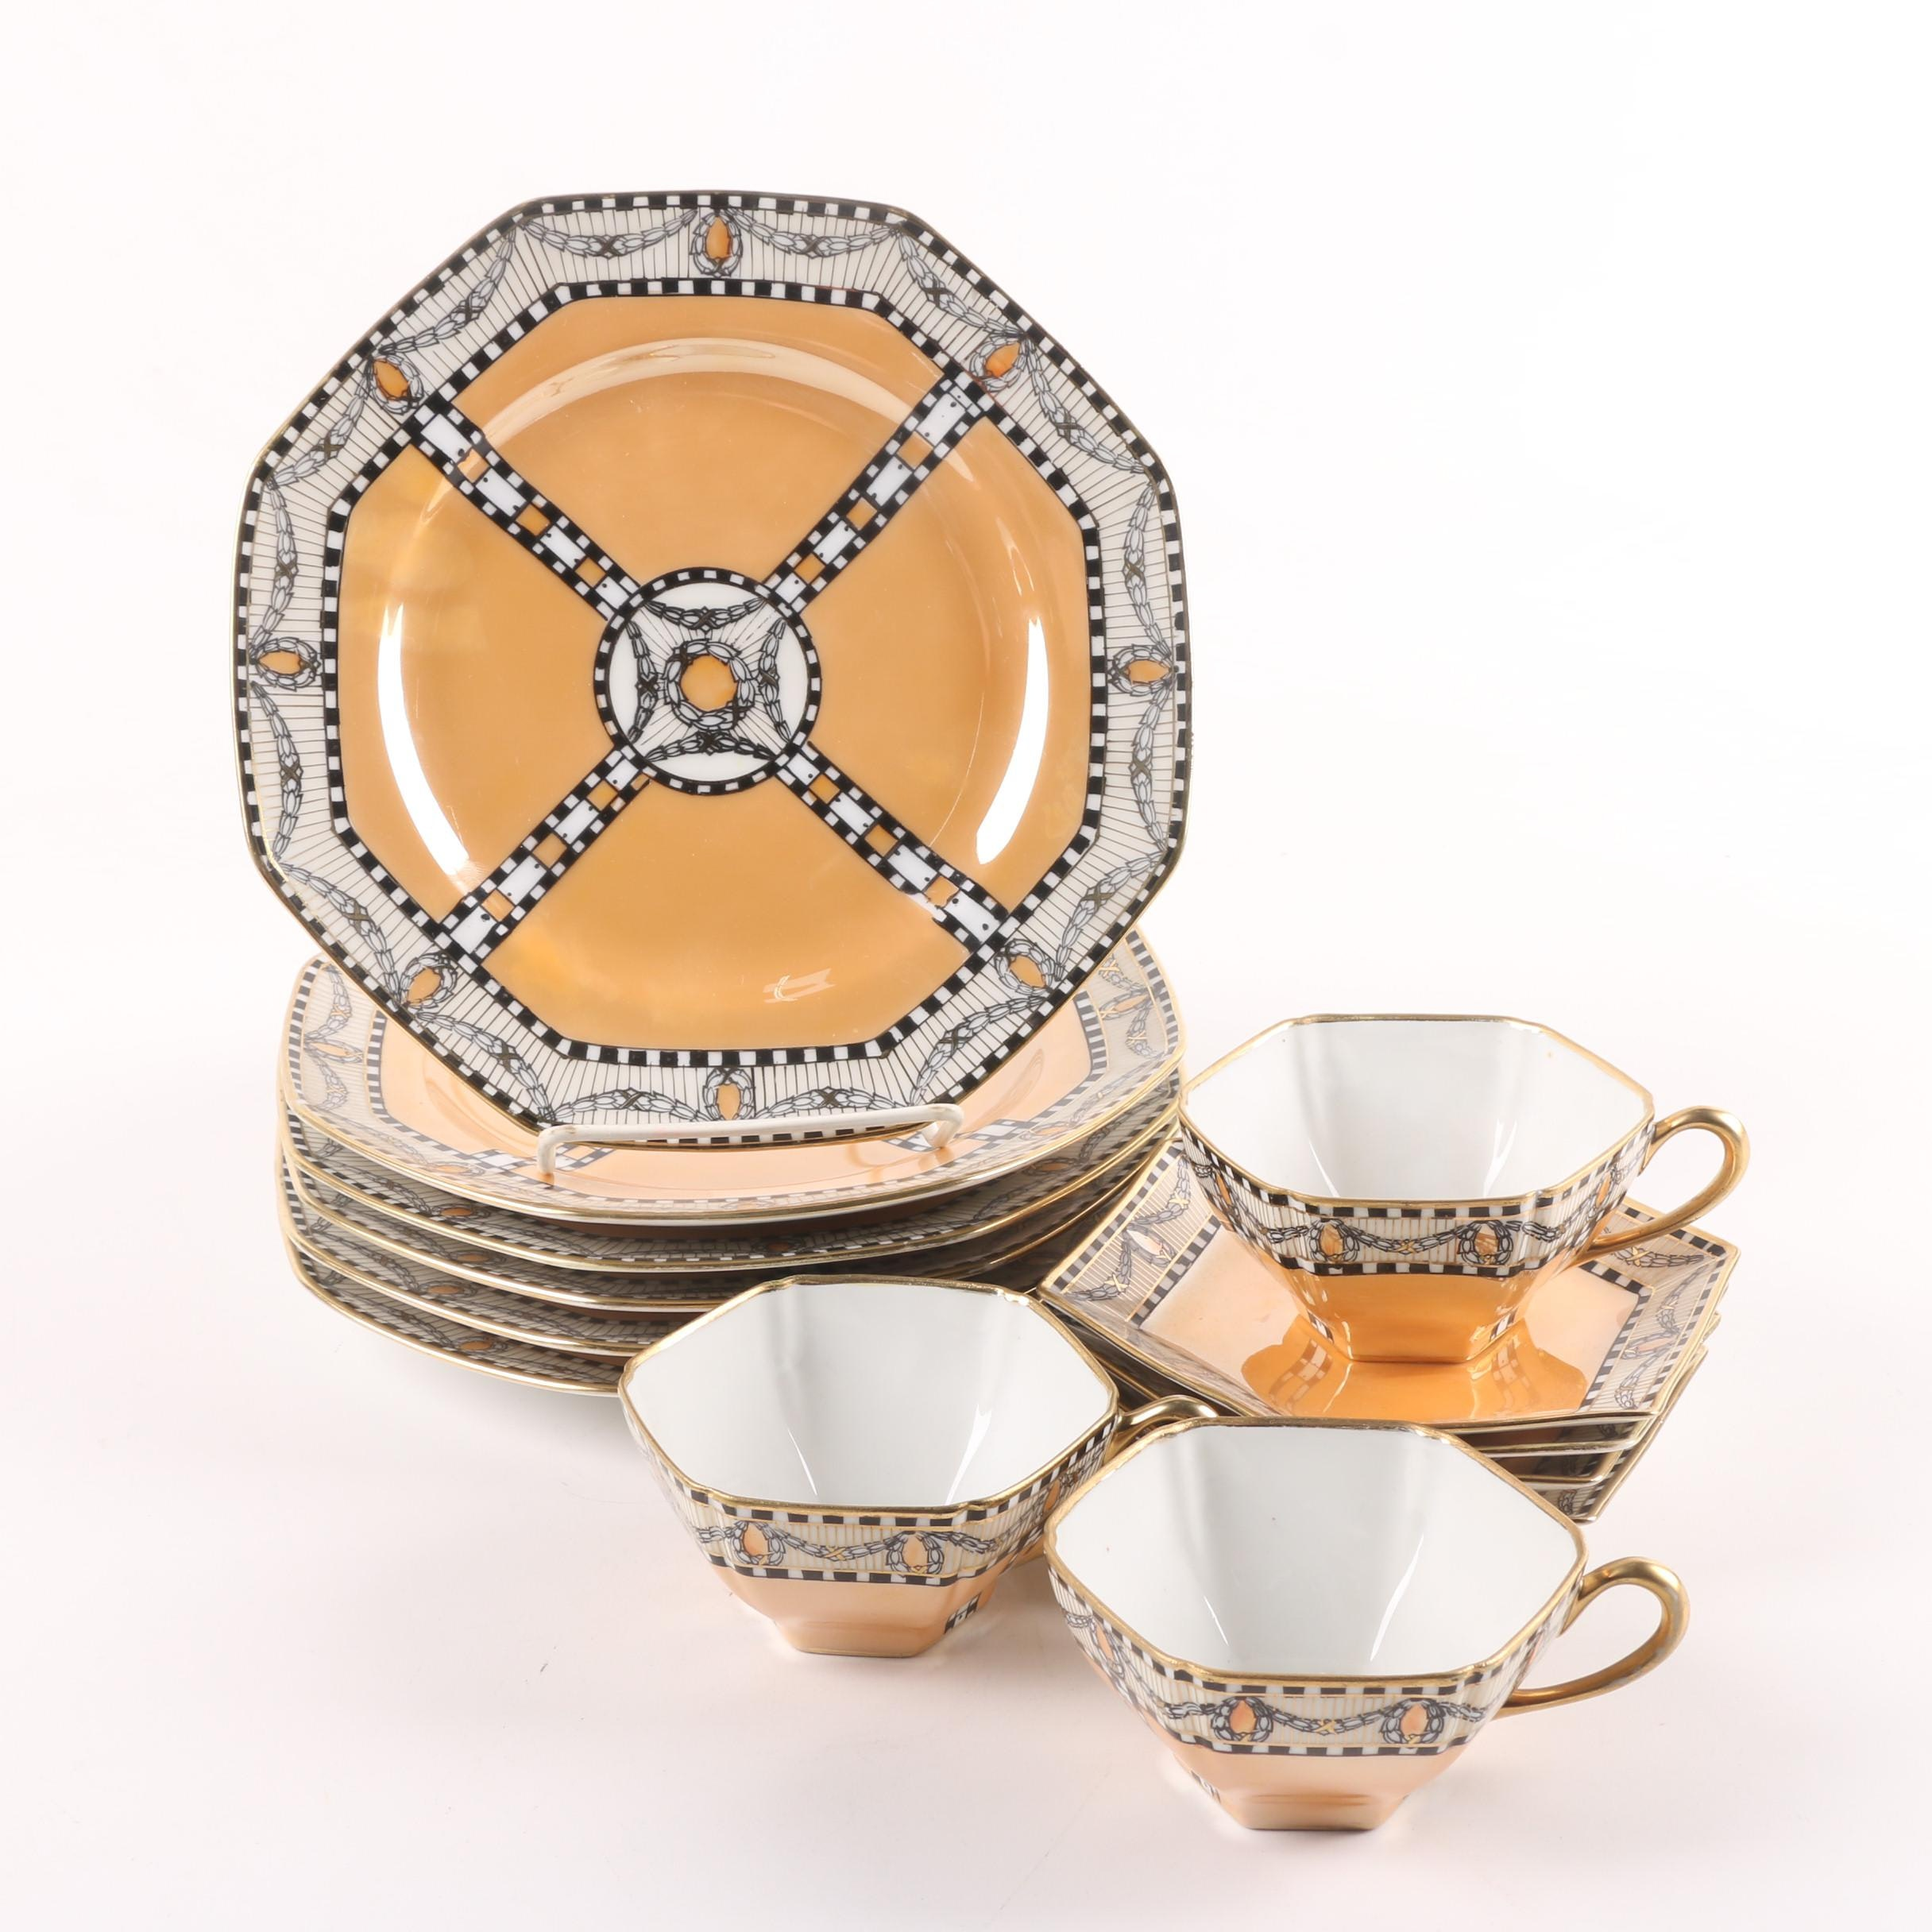 Noritake Peach Lusterware Porcelain Octagonal Dinnerware c. 1930s